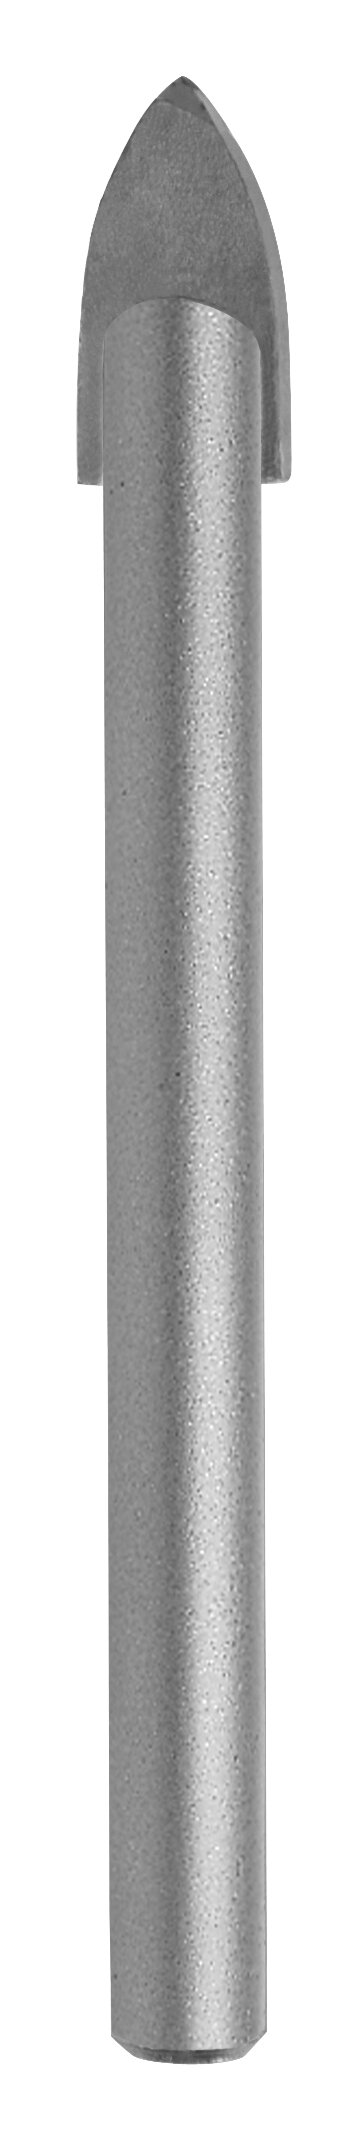 Ruko Glass and Tile Drill Bits